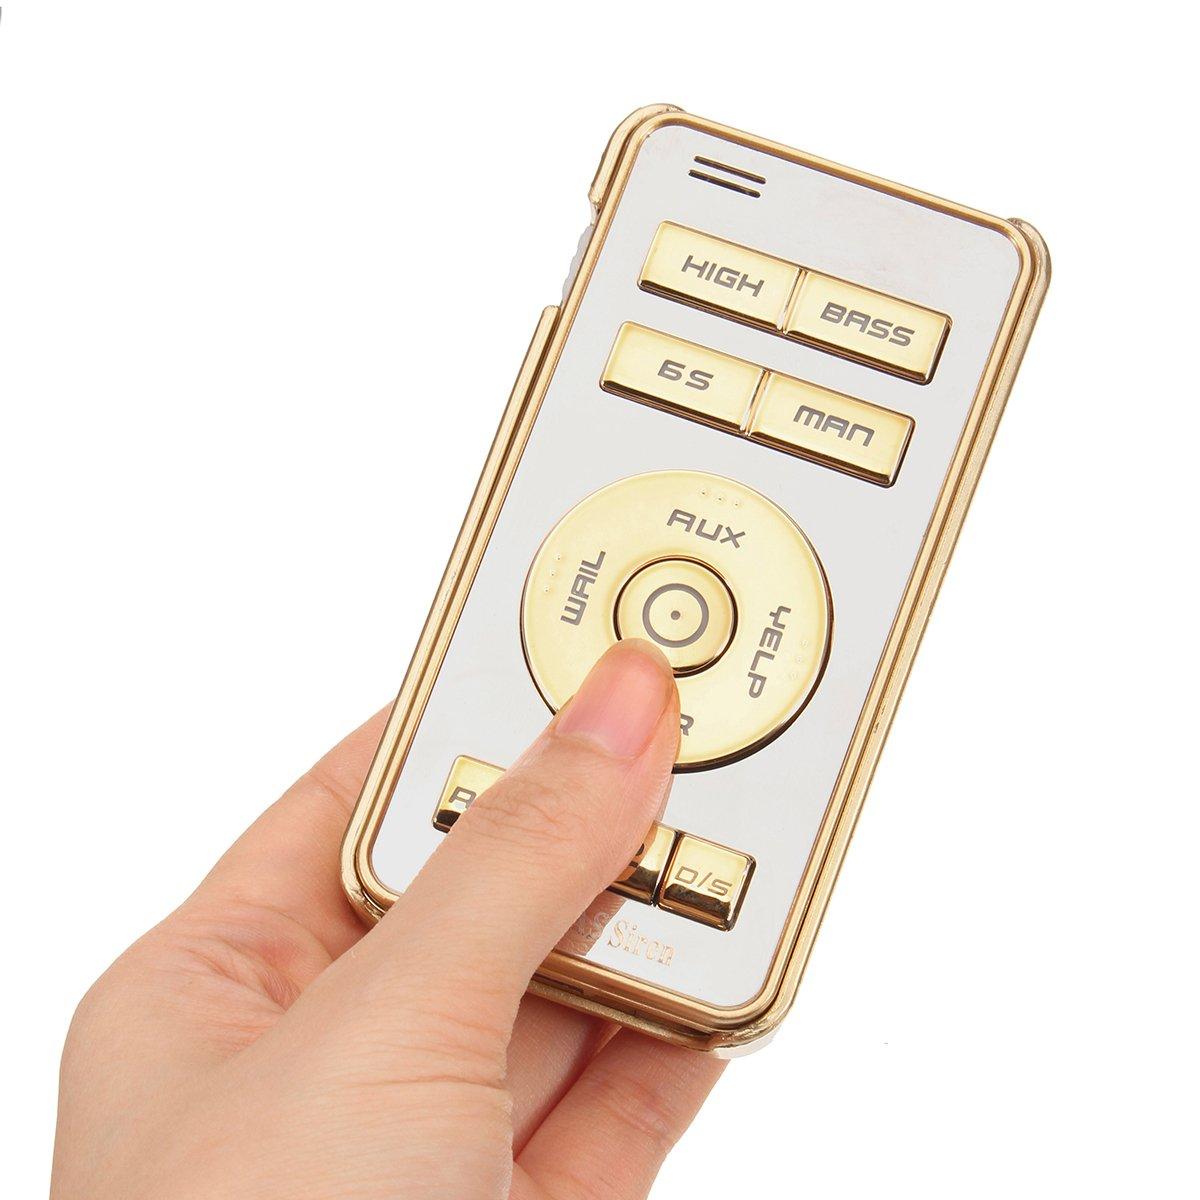 Alamor 200W alarme avertisseur sonore bruit de la police sir/ène avertisseur sono syst/ème